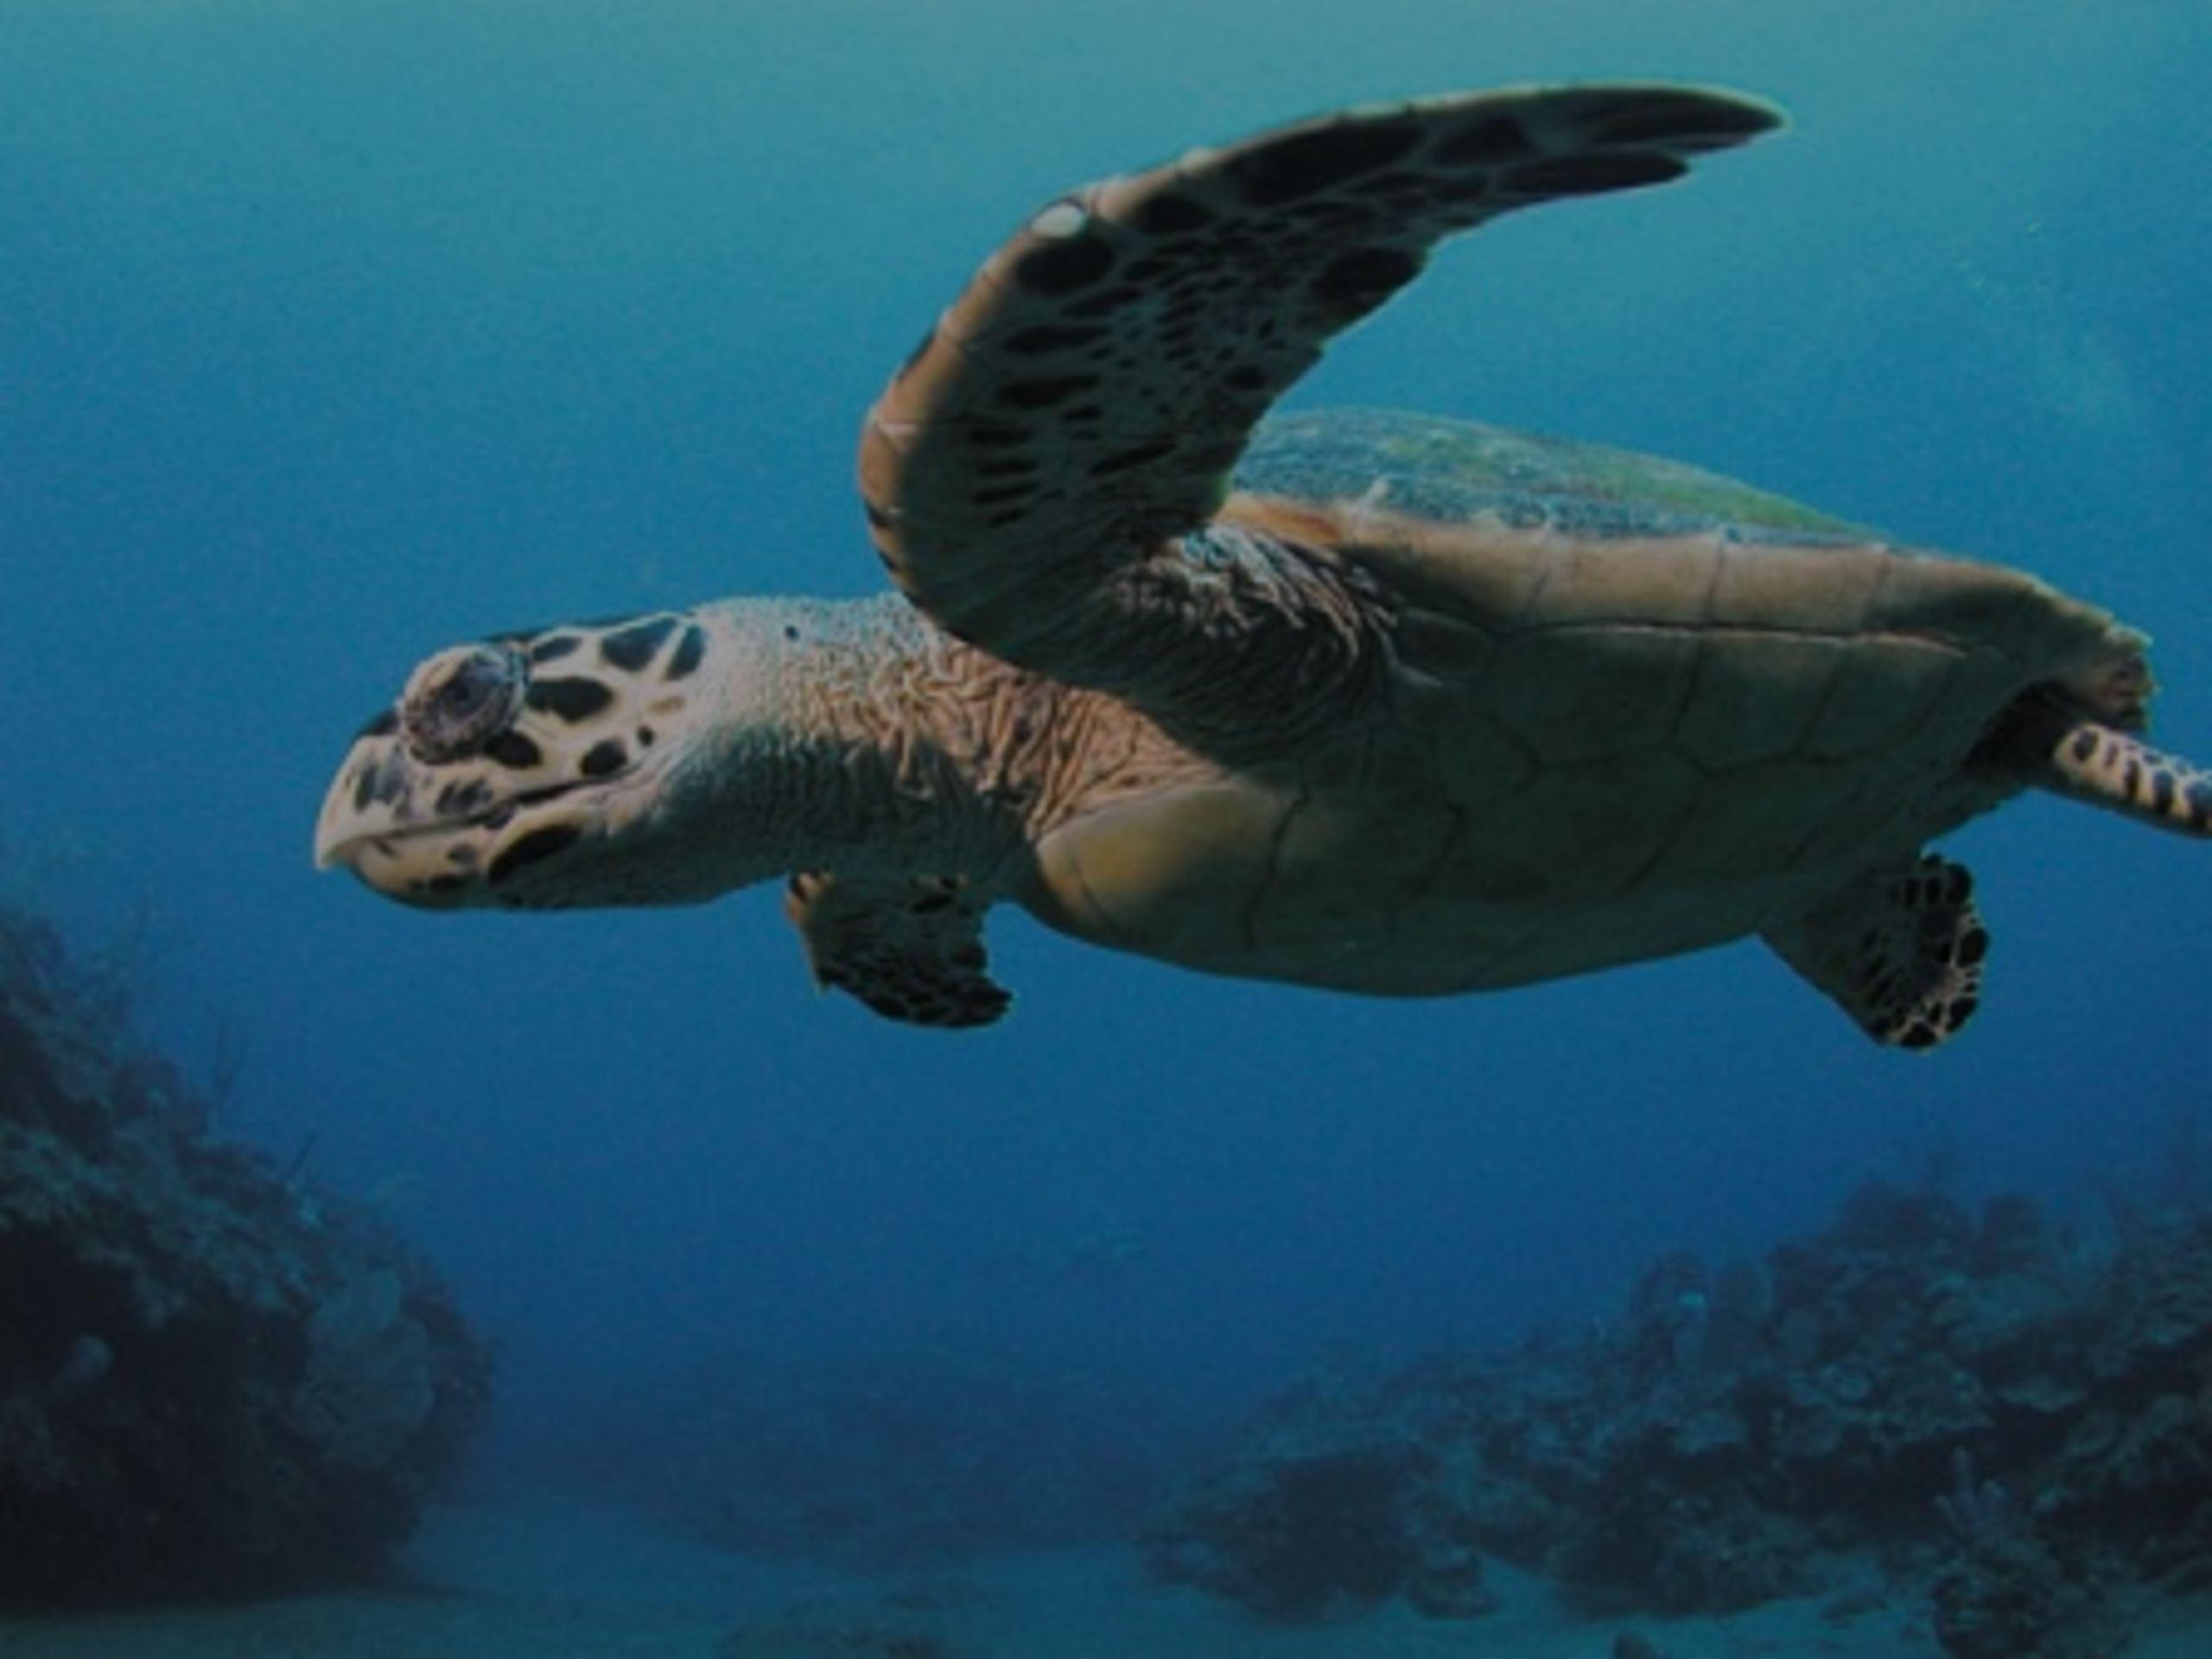 Alabama Gulf Coast Sea Turtles